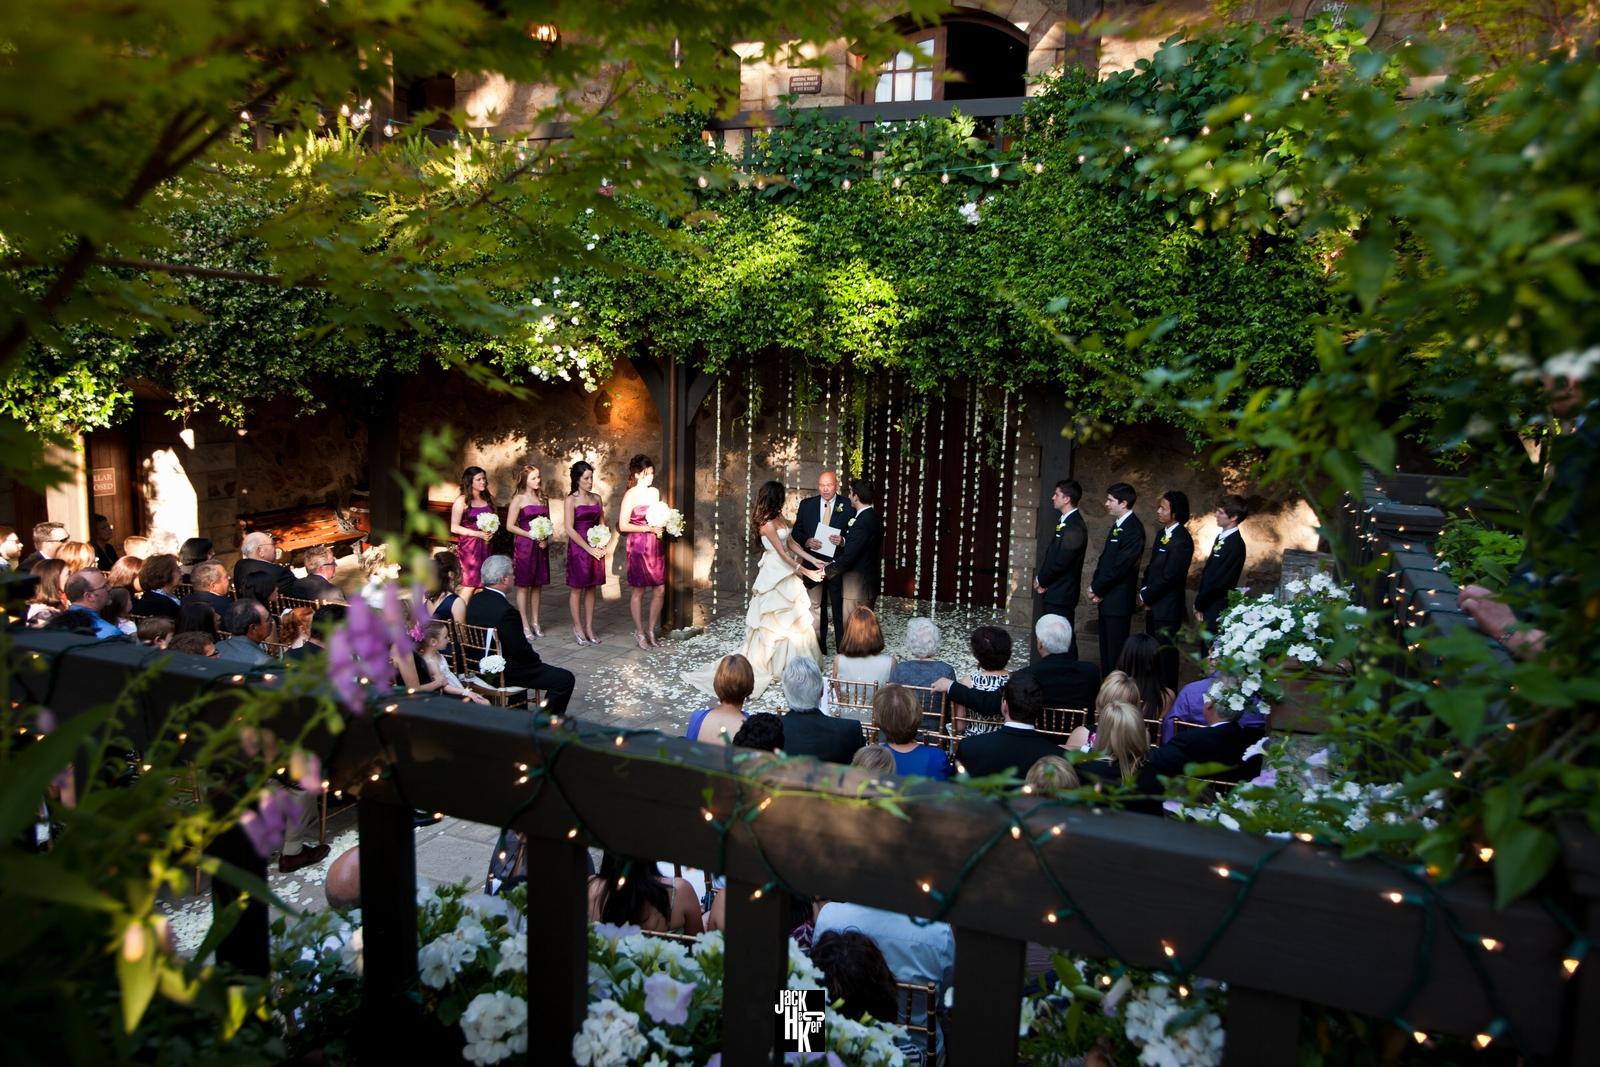 V Sattui Winery Wedding V Sattui Winery Weddings